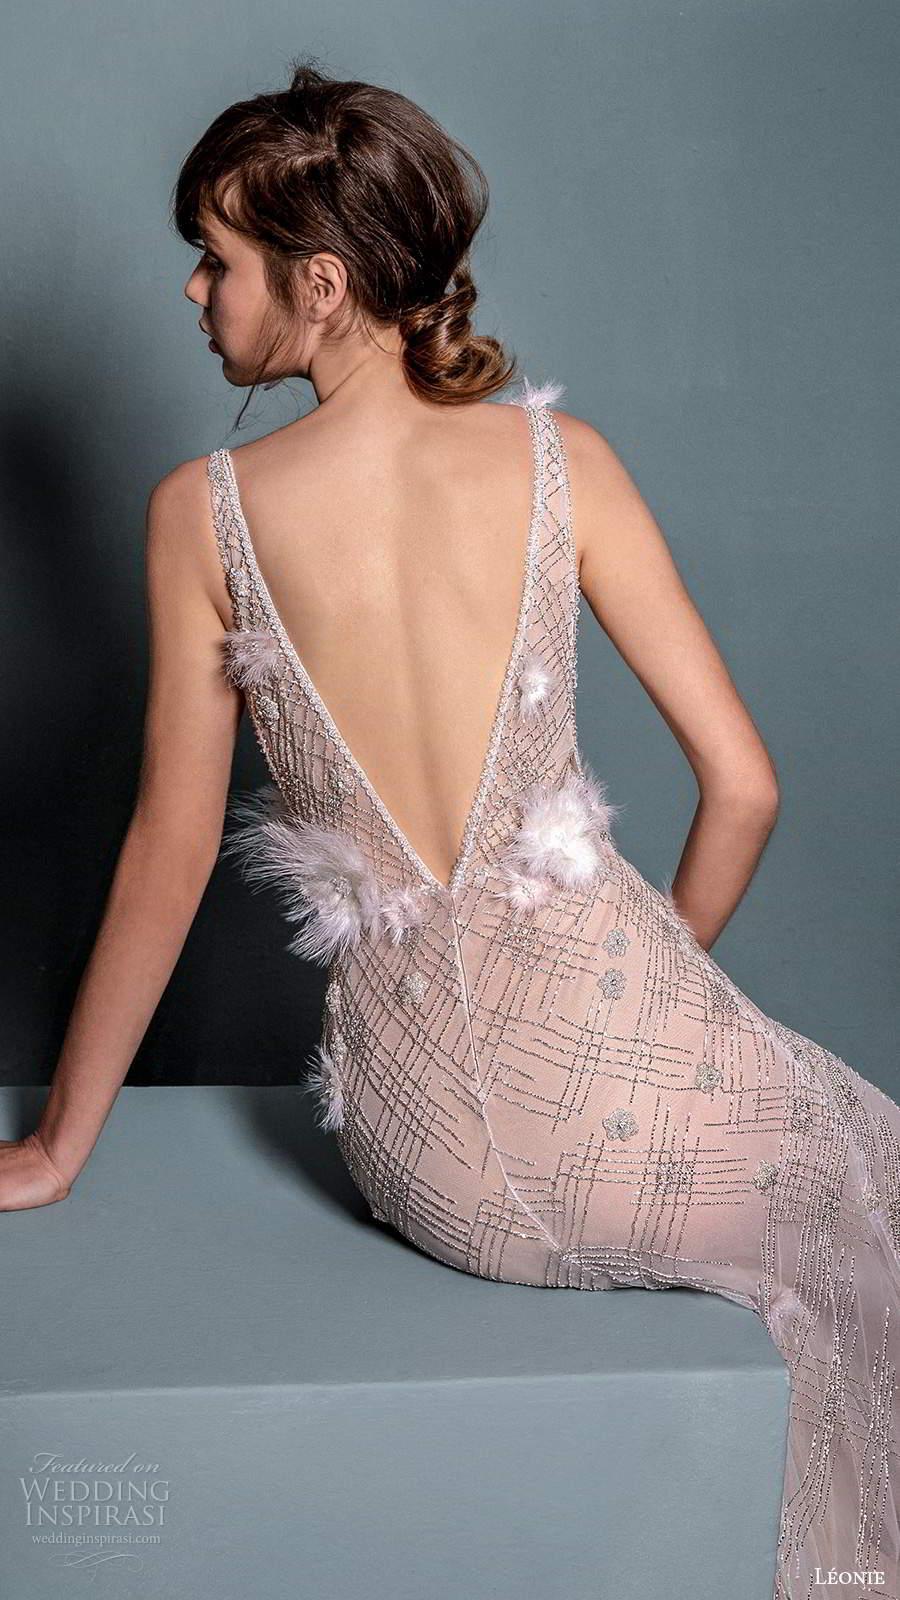 leonie bridal 2020 bridal sleeveless straps plunging neckline fully embellished sheer sheath wedding dress chapel train (6) zbv